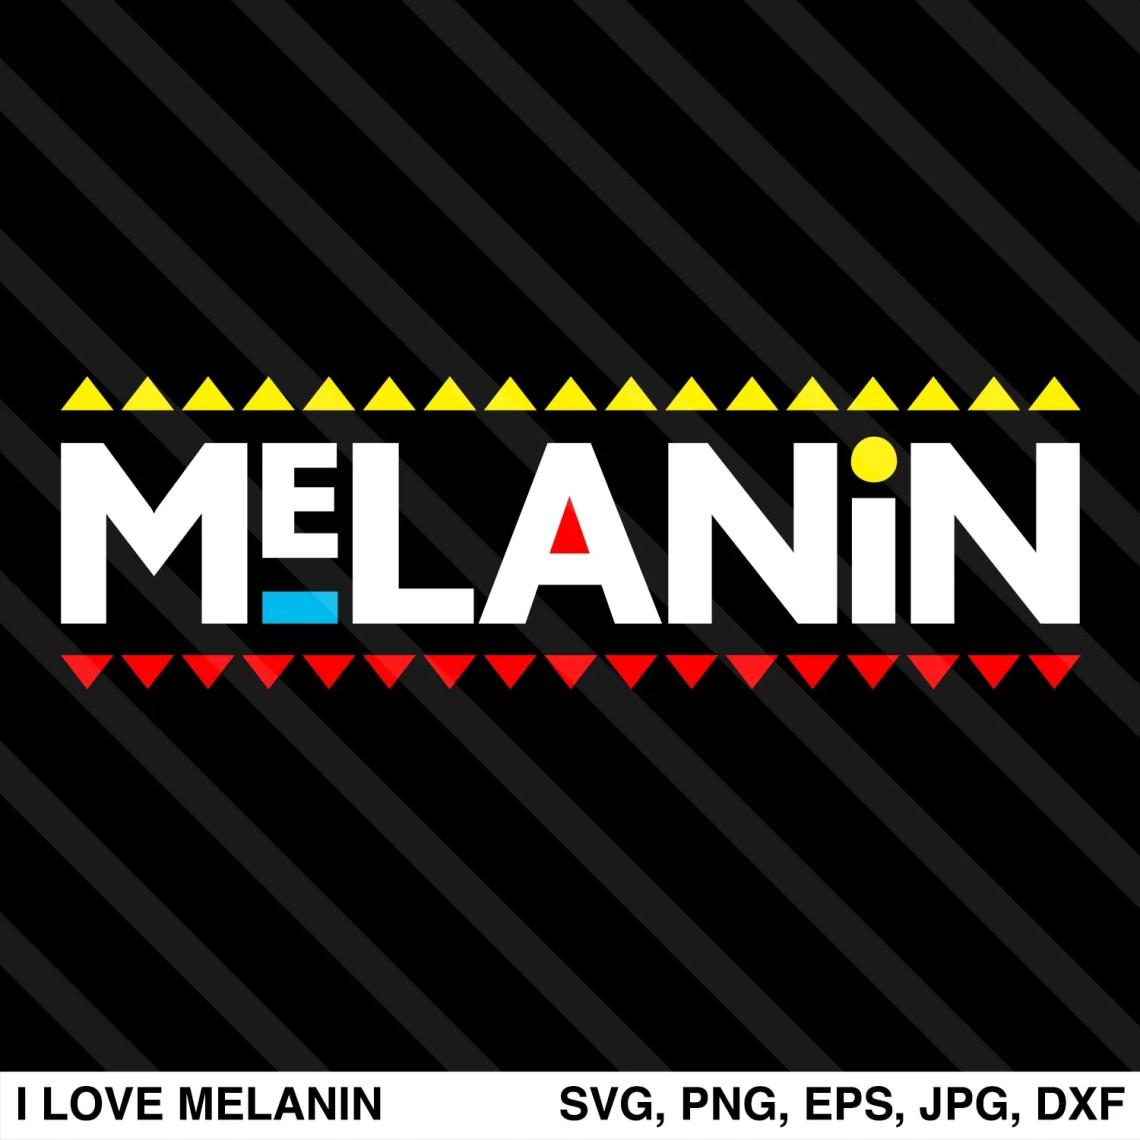 Download Melanin SVG - I Love Melanin